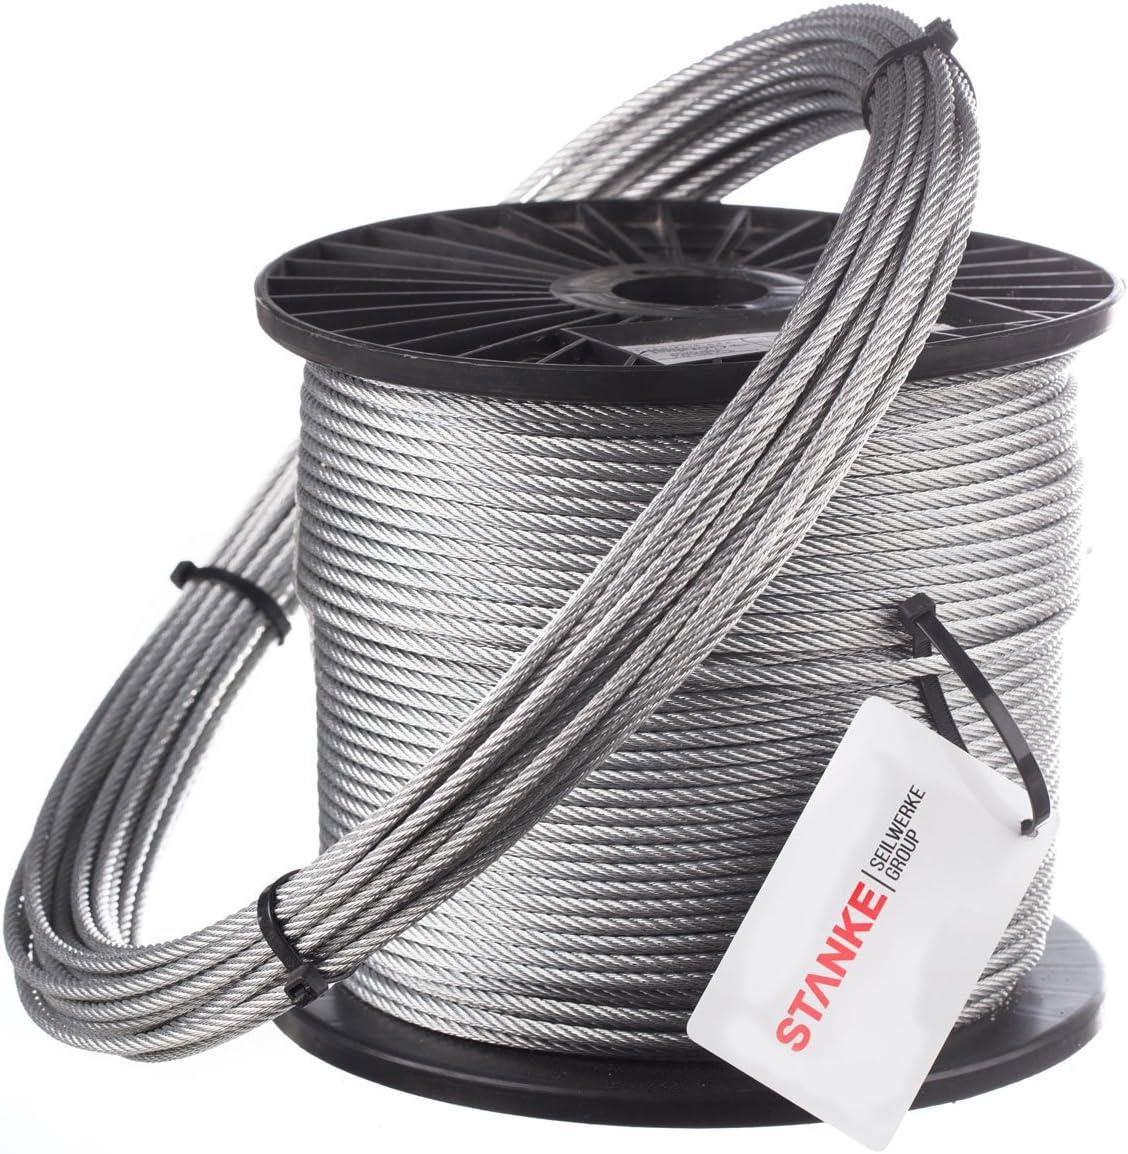 Seilwerk STANKE 1m Drahtseil 10mm 6x37 Forstseil Windenseil Stahlseil VERZINKT DIN Seil Draht Stahl